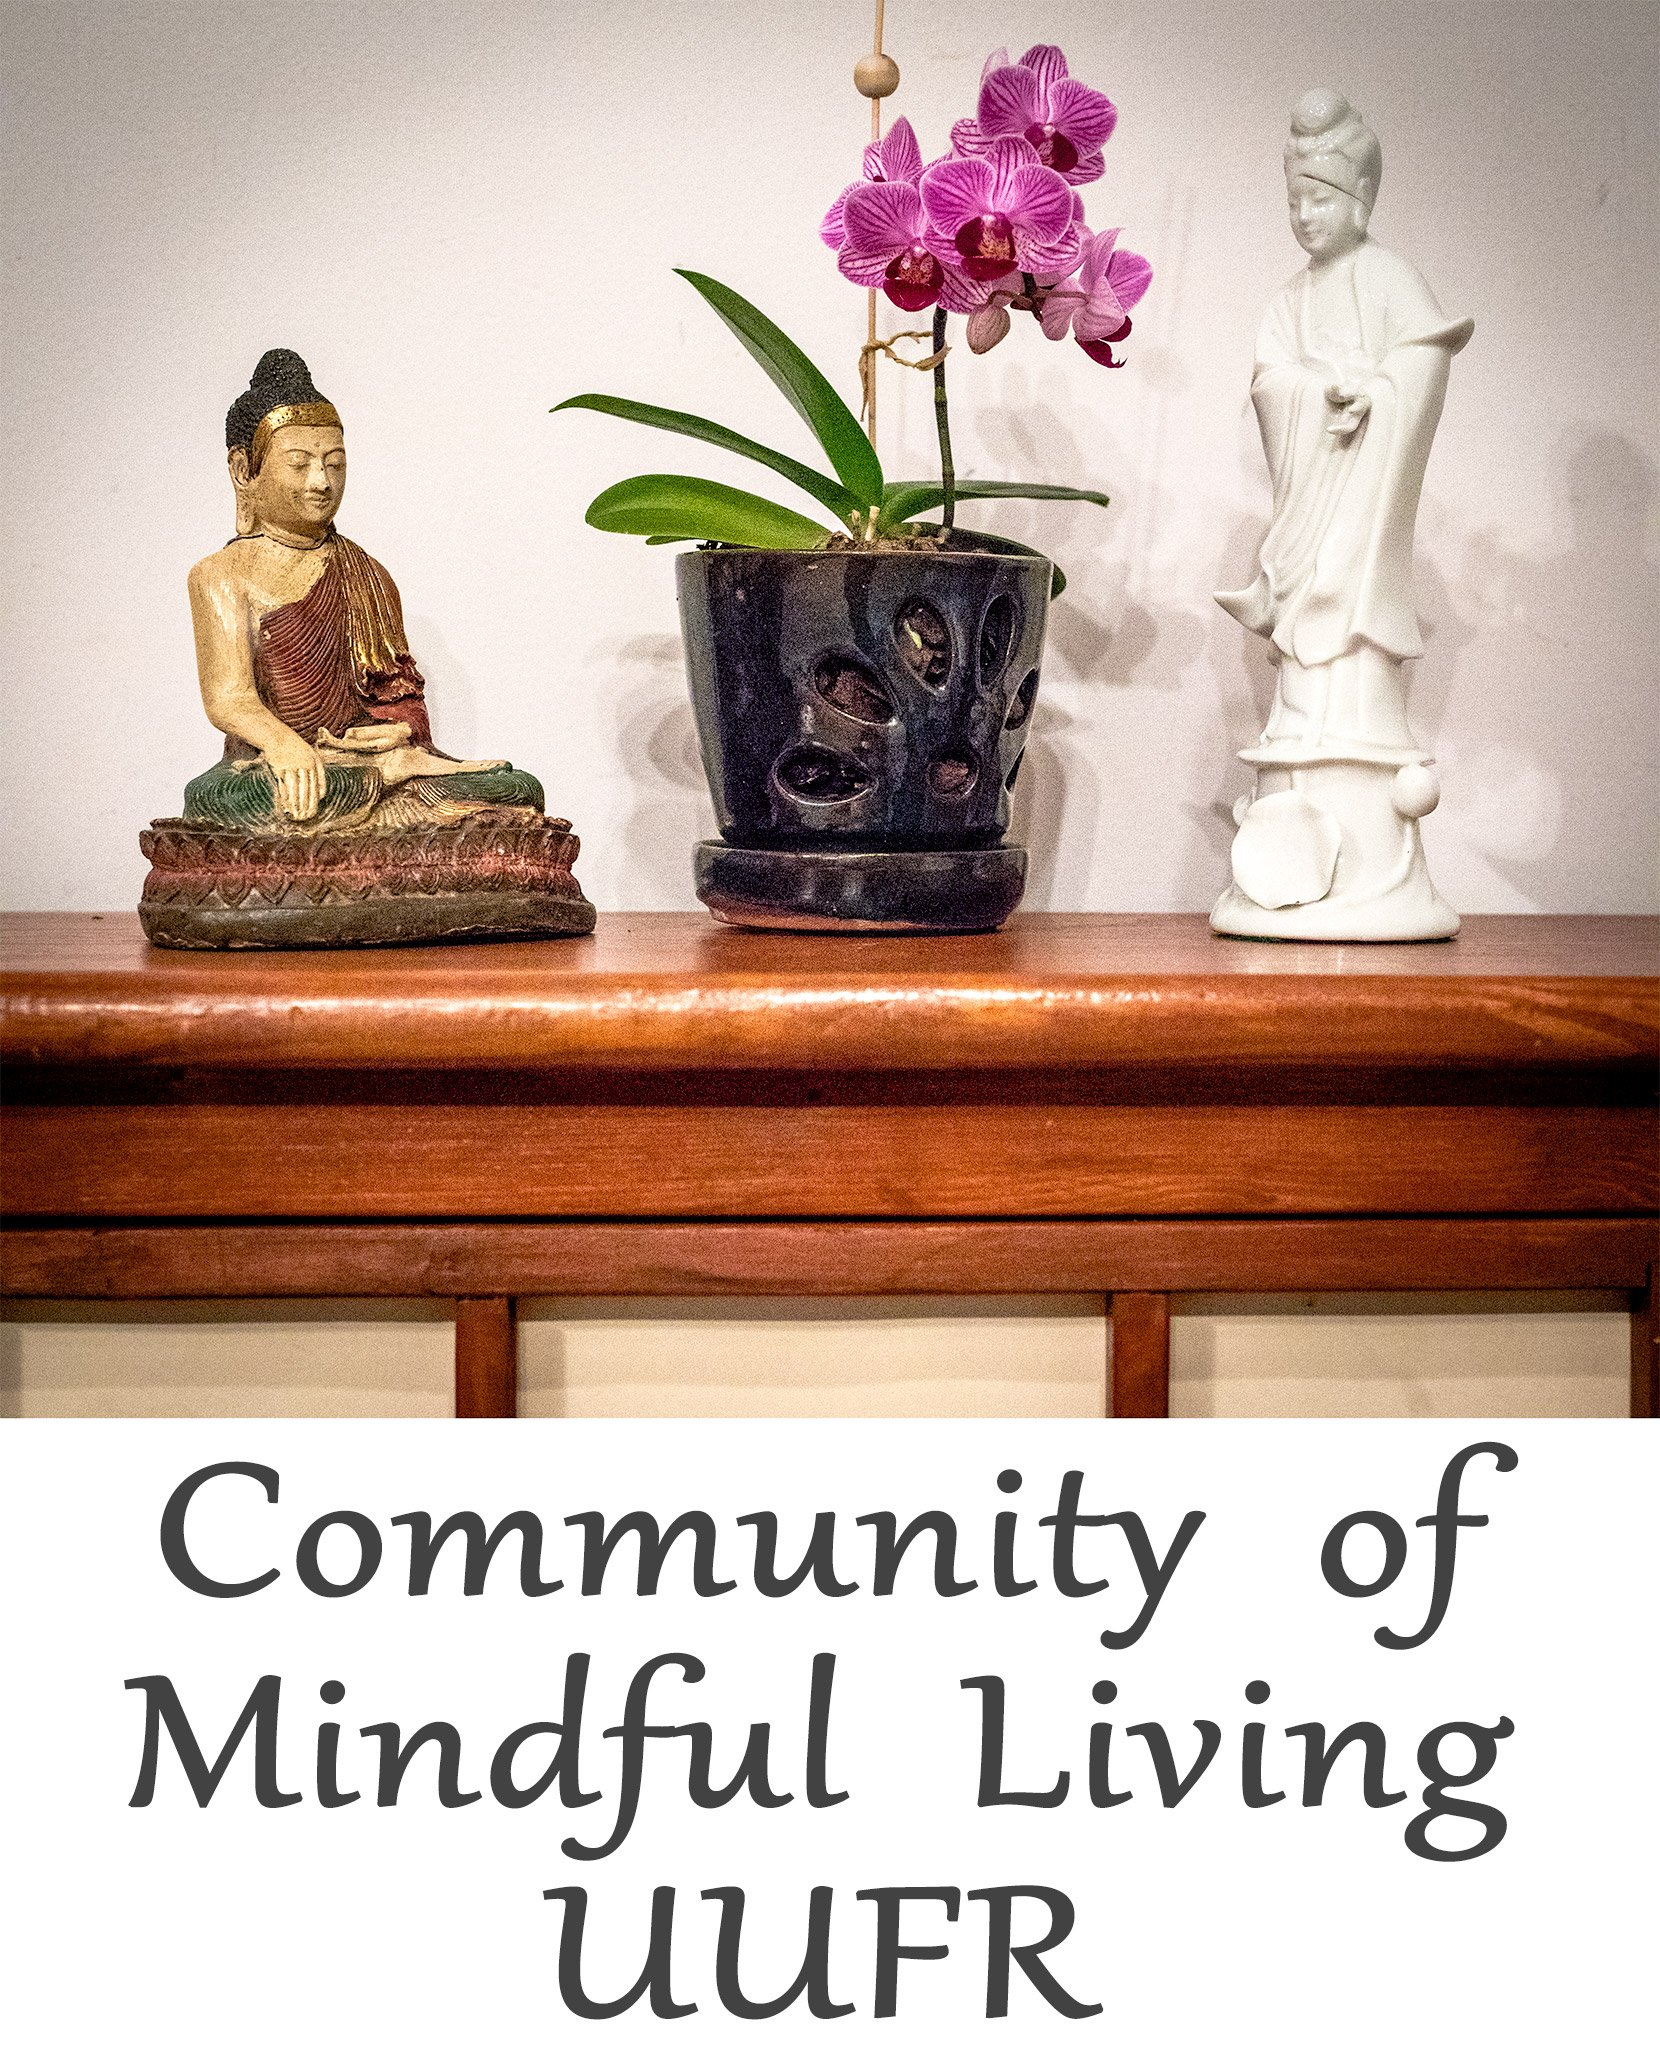 Community of Mindful Living – UUFR